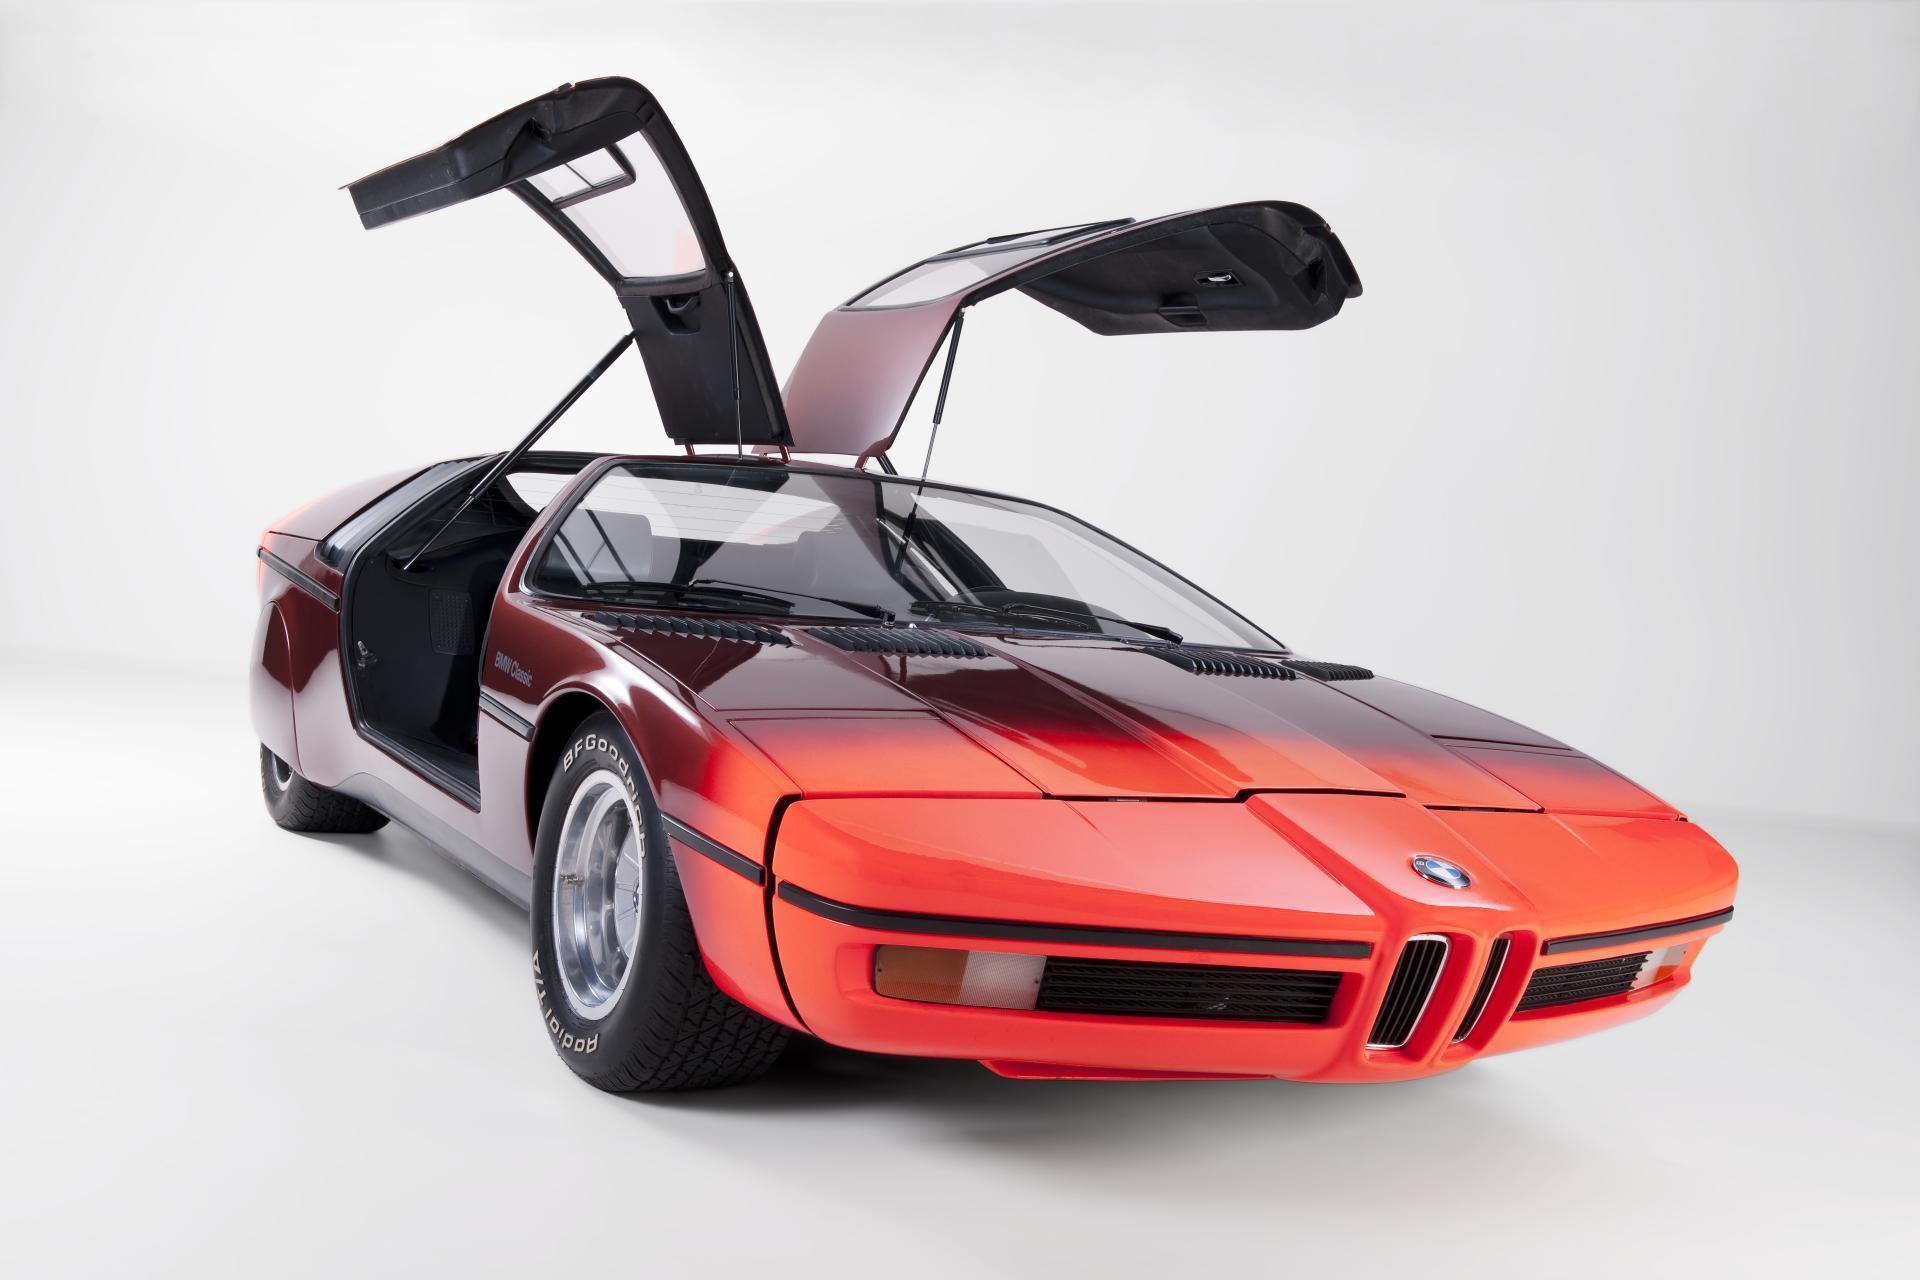 Bmw M1 S Predecessor Bmw Braque Turbo Autoevolution